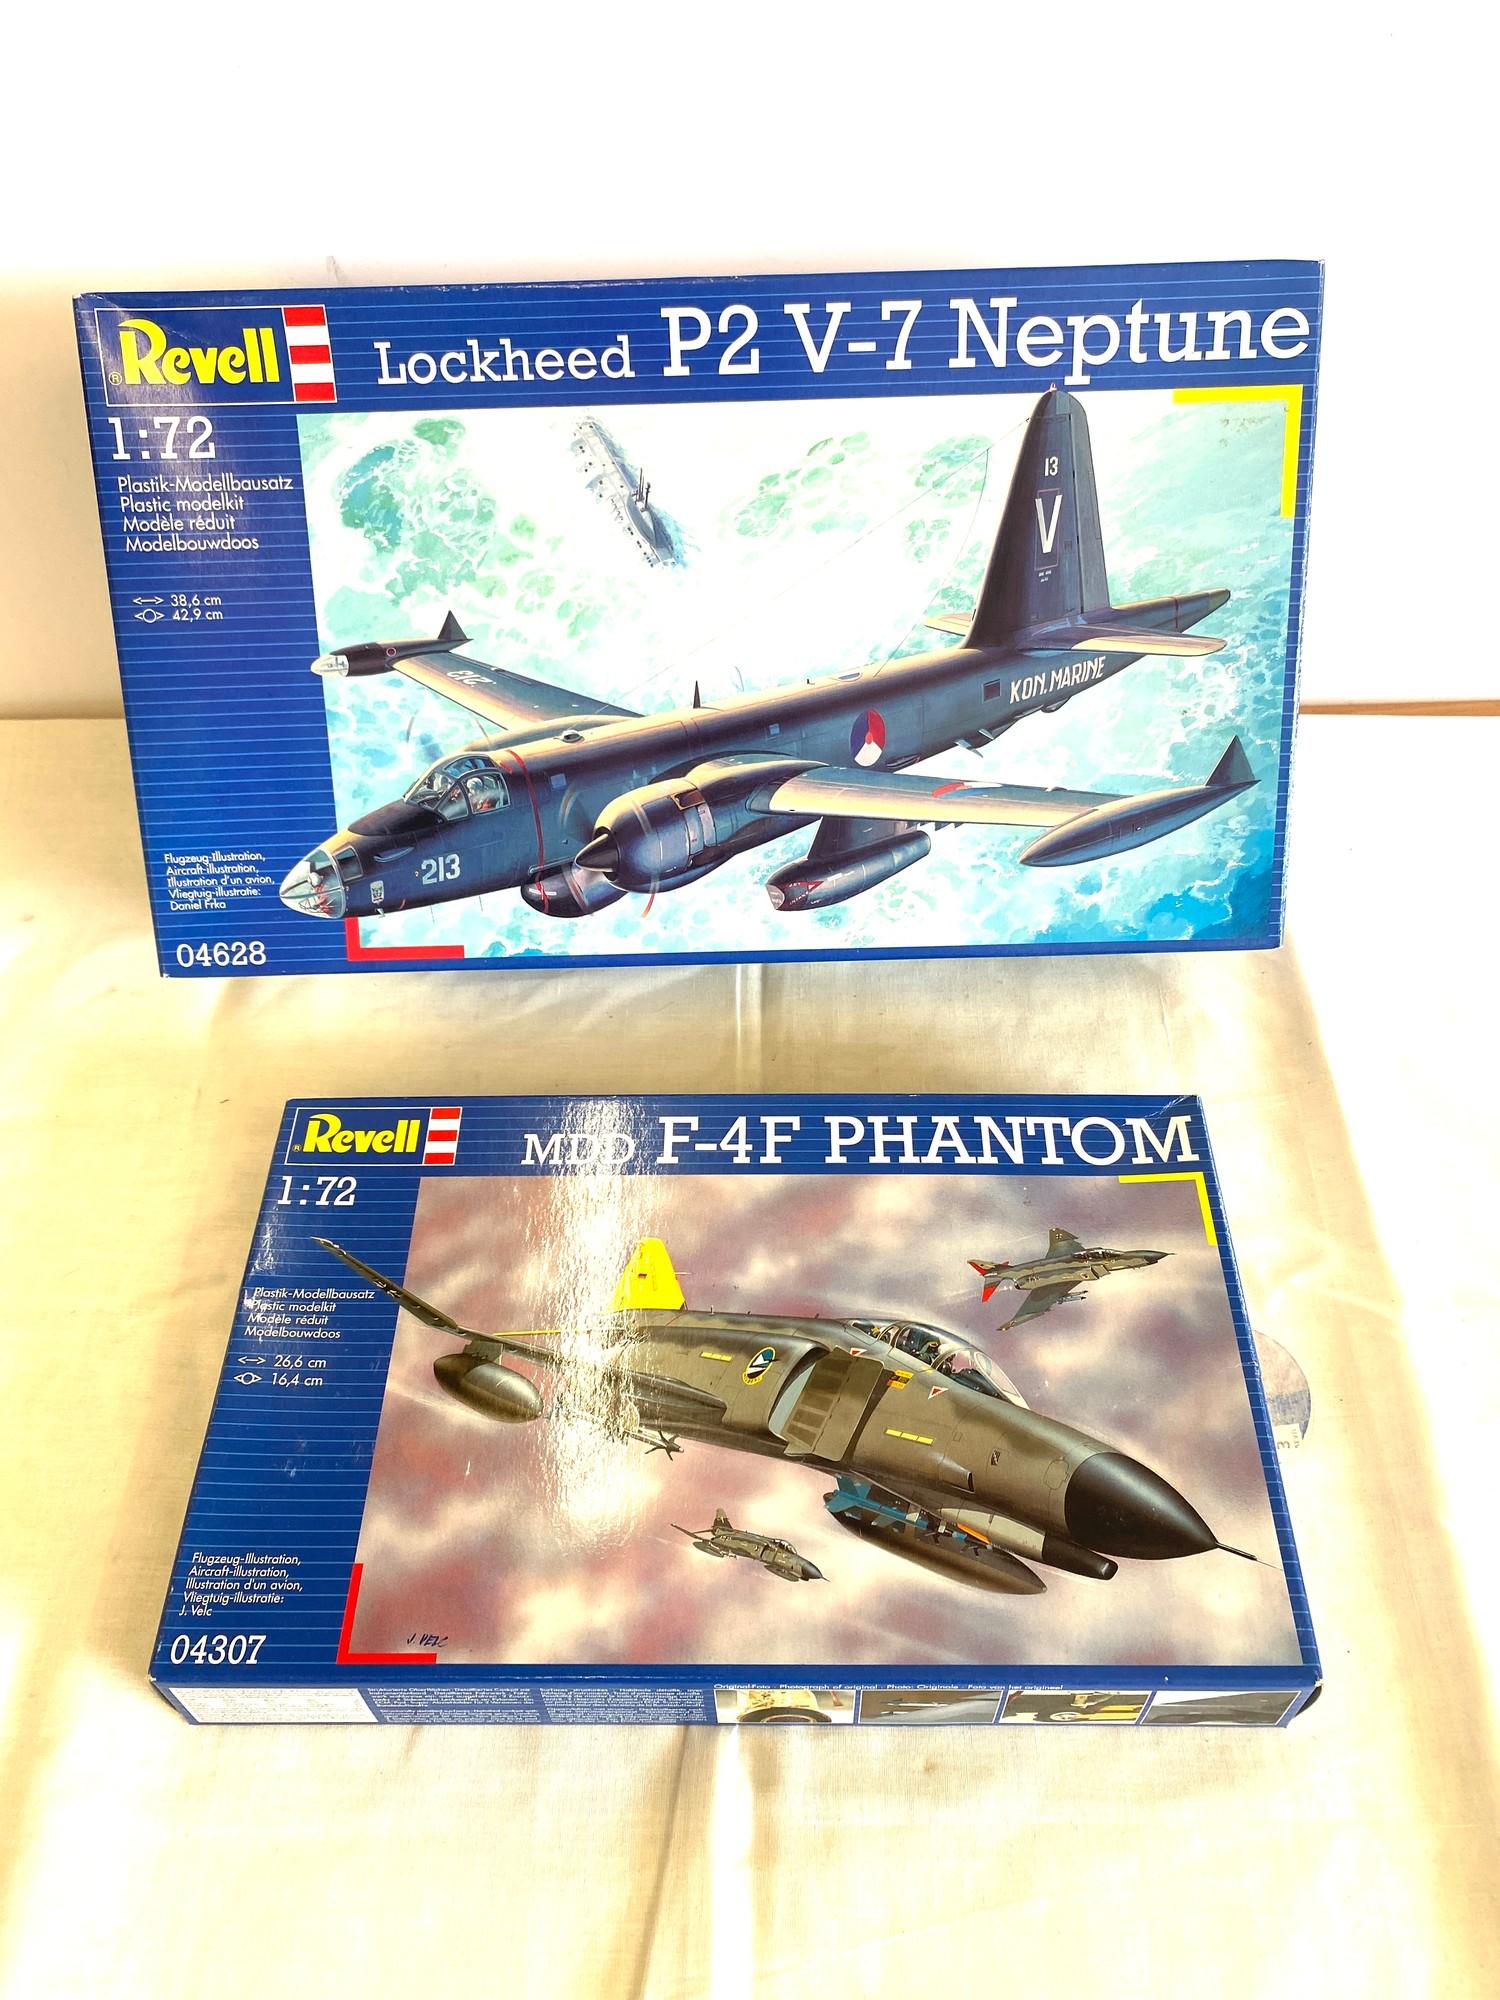 2 boxed craft models, Revell Lockhead P2 v-7, Mdd F-4F Phantom 04307